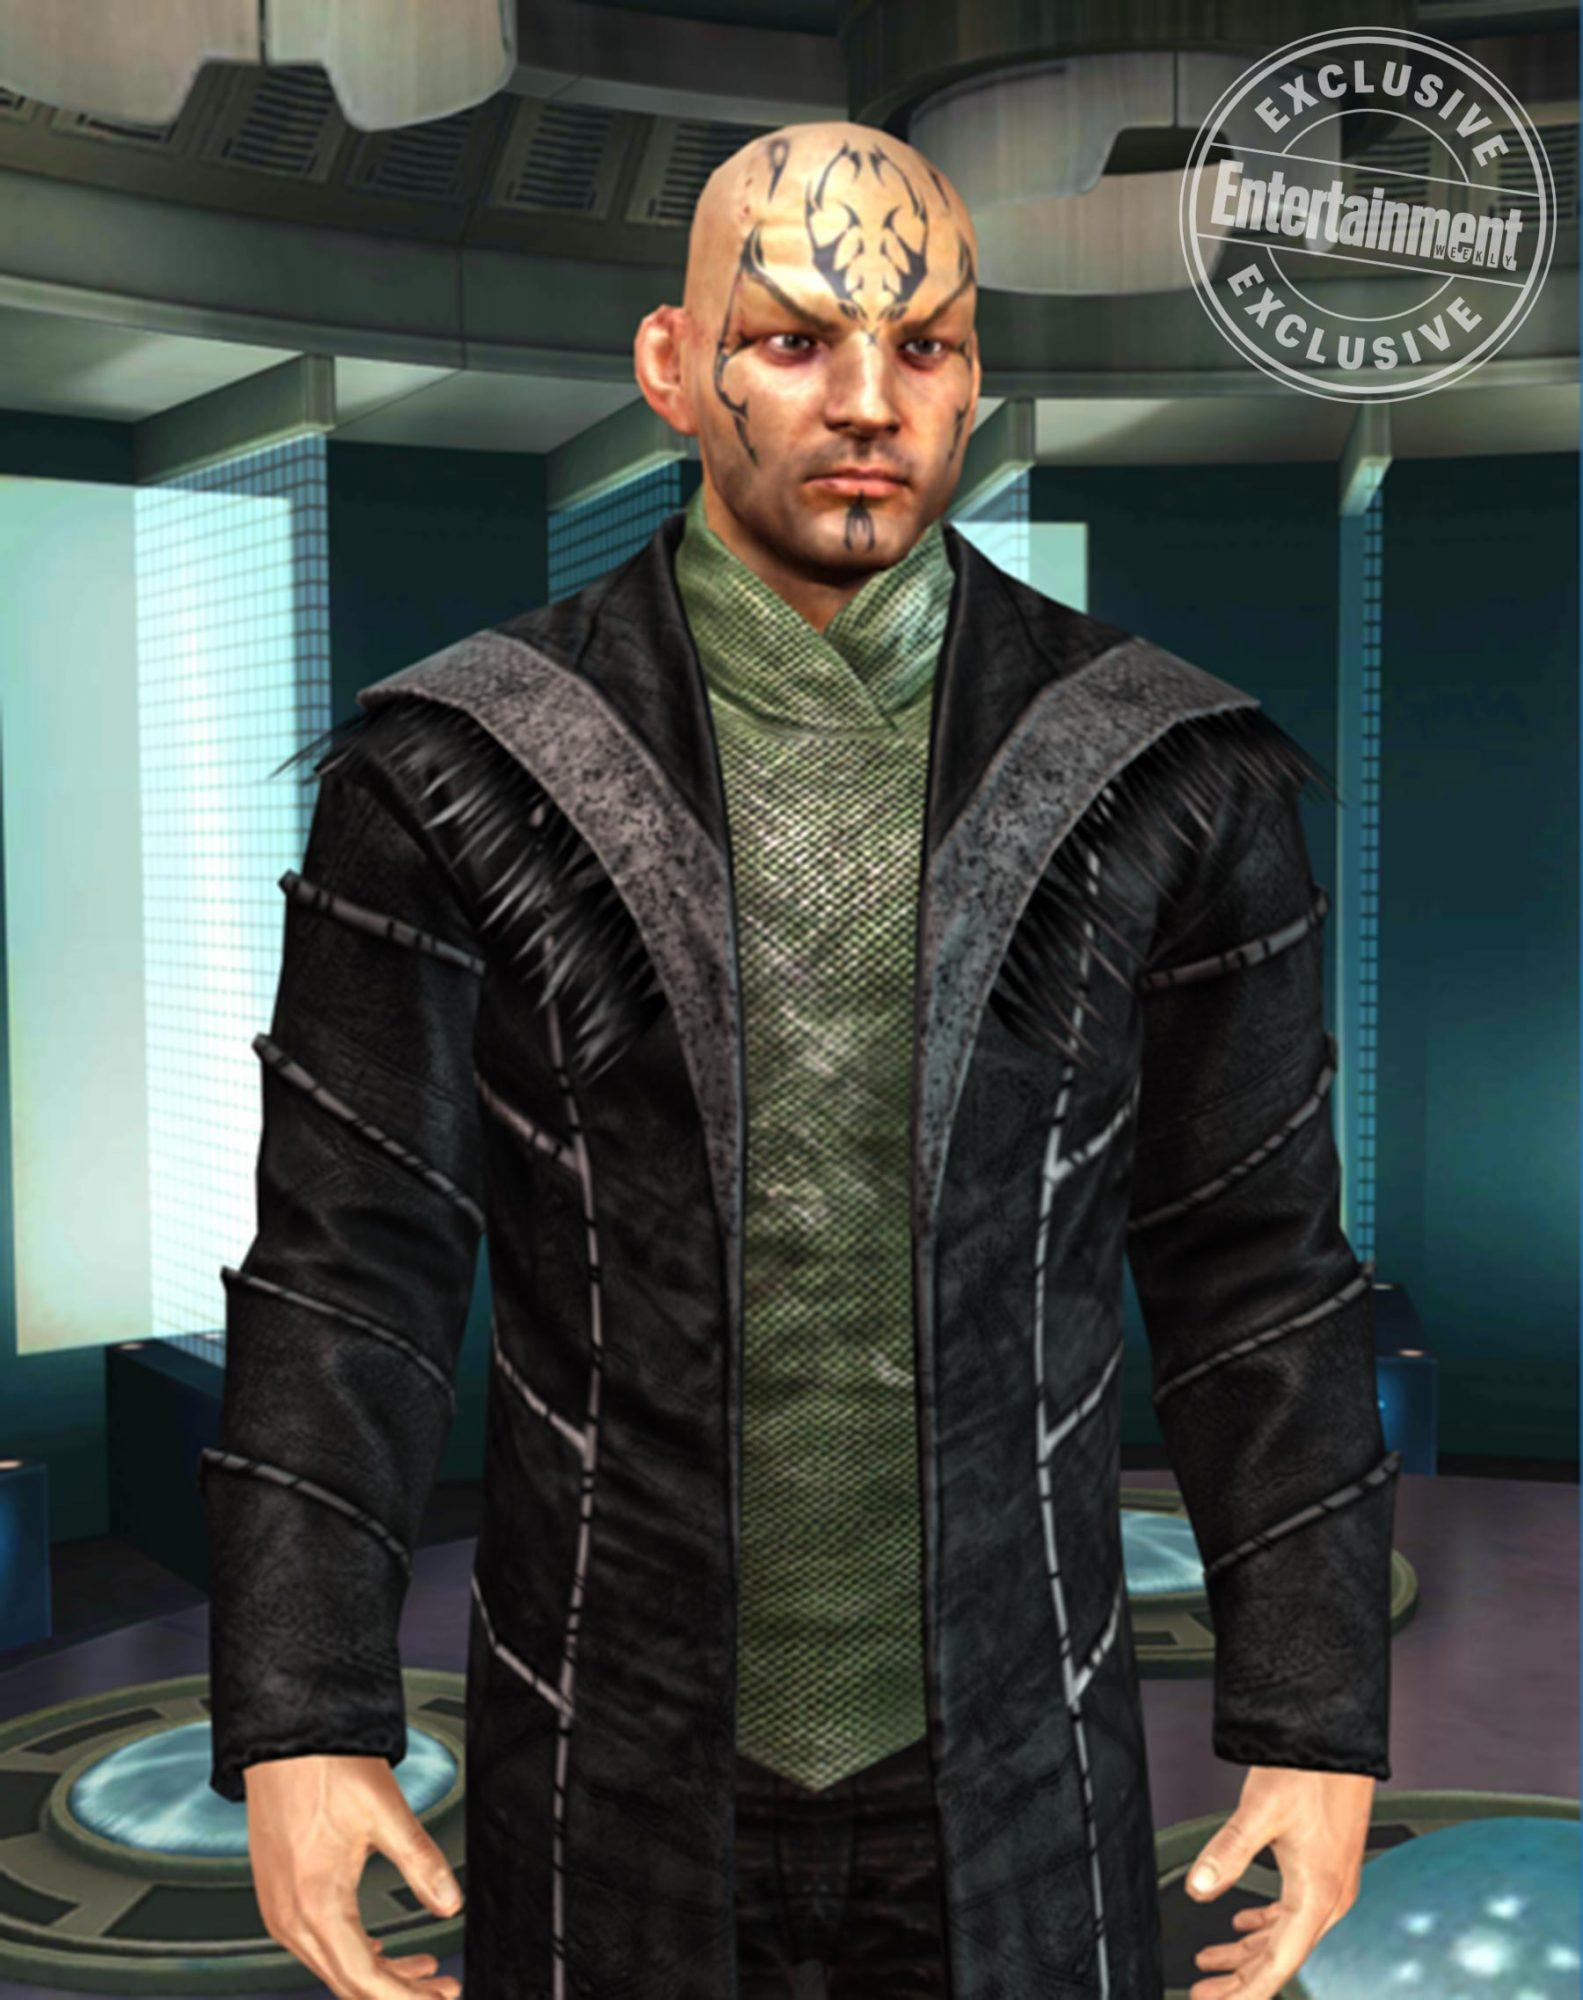 Star Trek Fleet CommandCR: Scopely and CBS Interactive